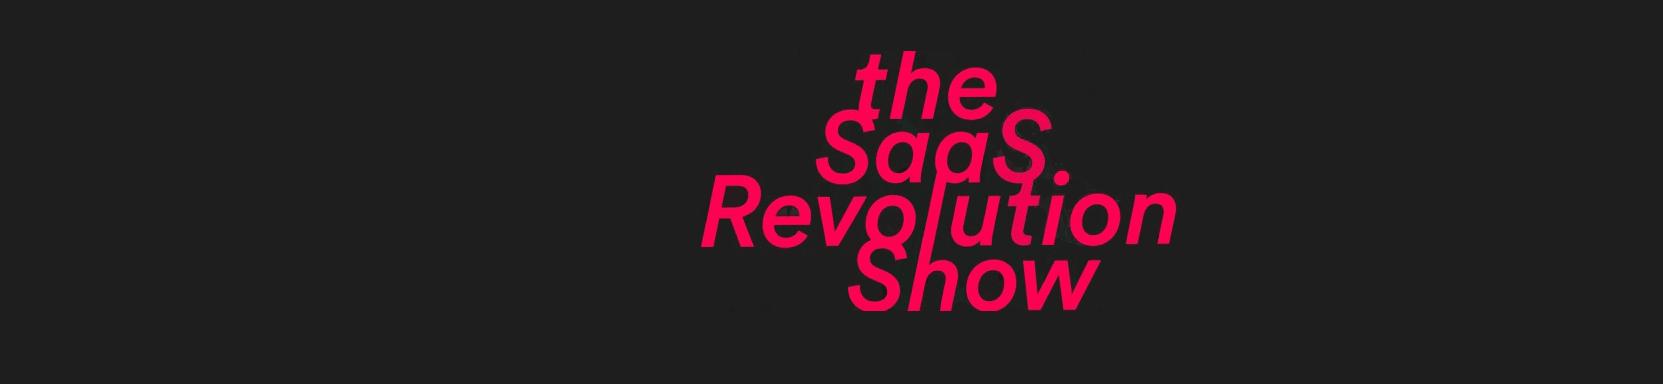 the SaaS Revolution Show Podcast